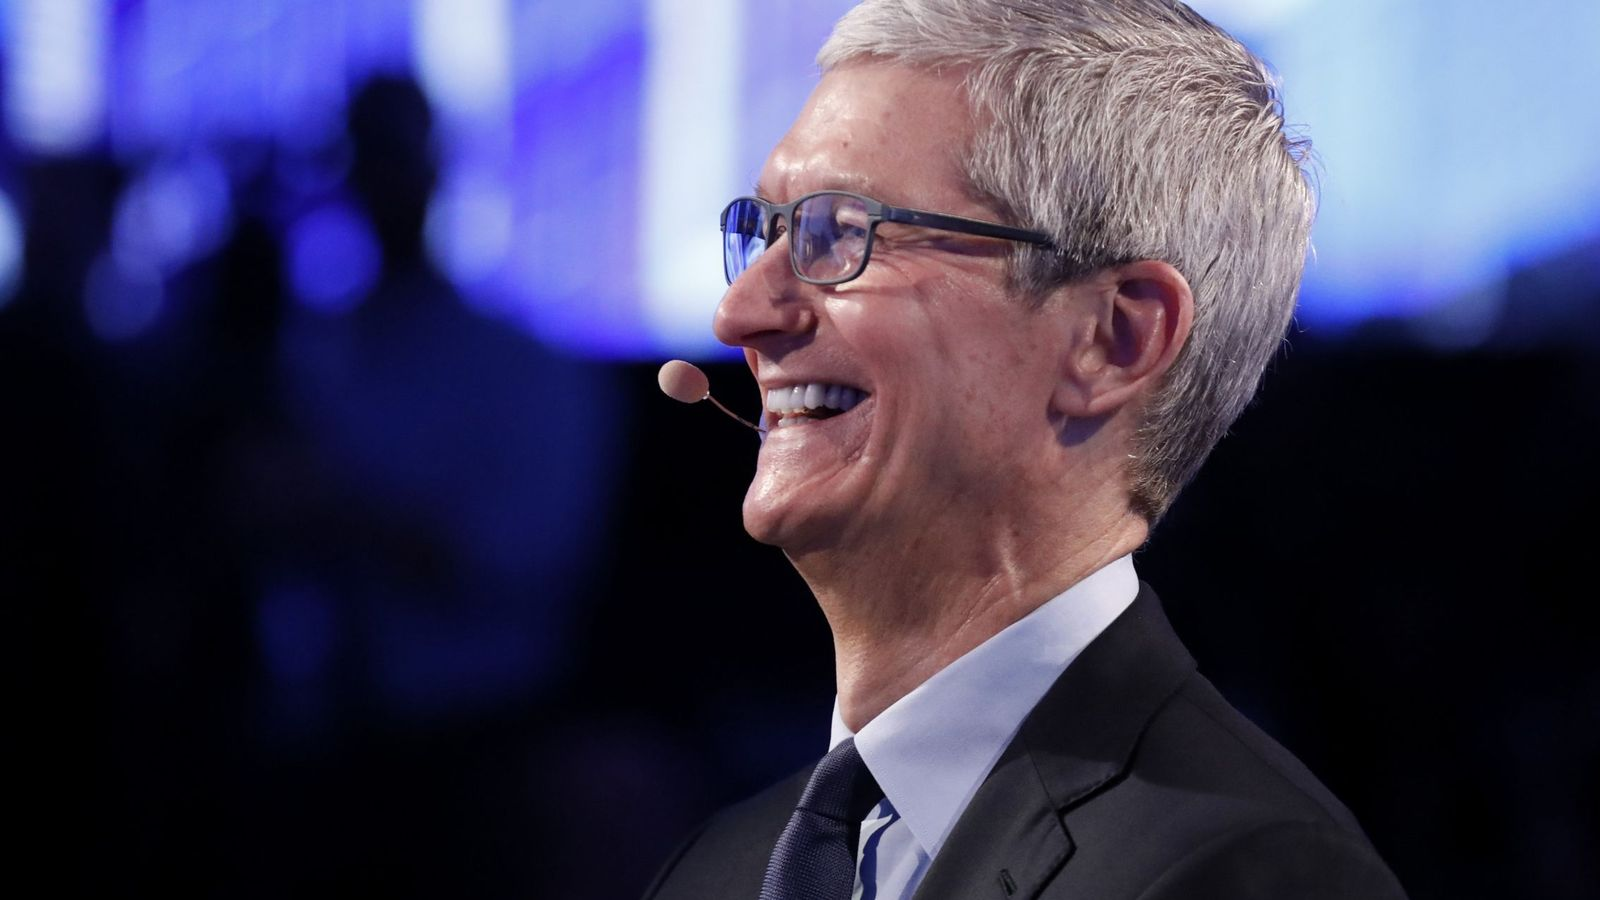 Foto: Tim Cook, CEO de Apple. (Brendan McDermid / Reuters)